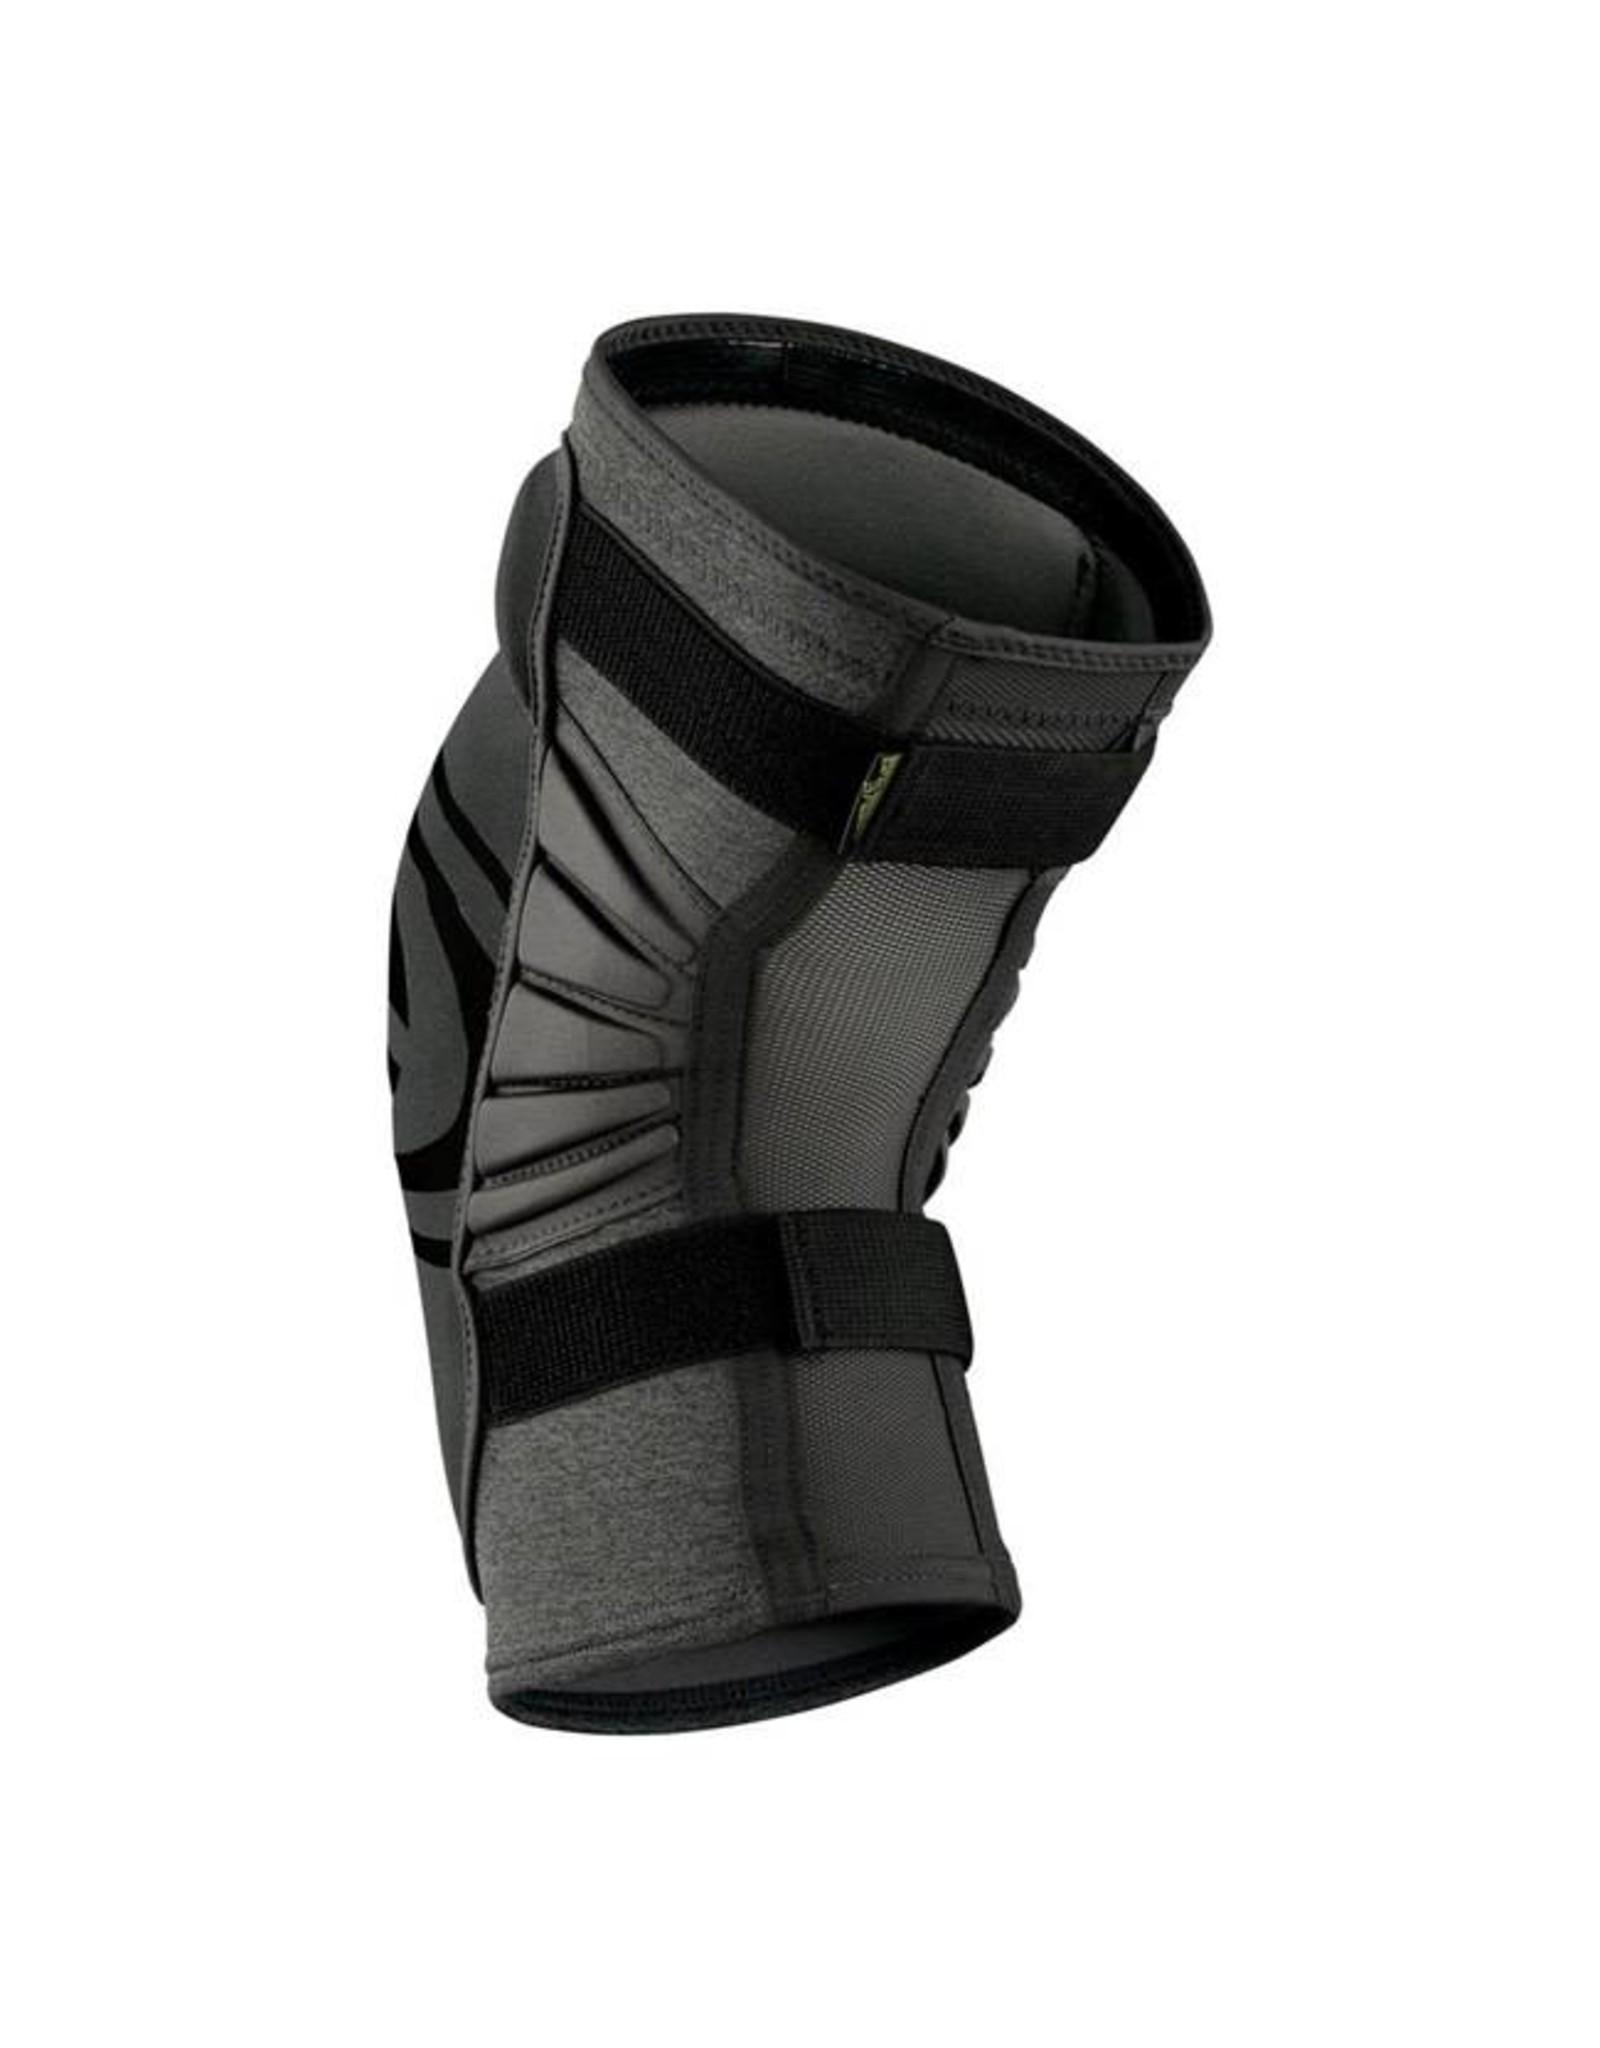 IXS iXS Carve Evo+ Knee Pads: Gray SM